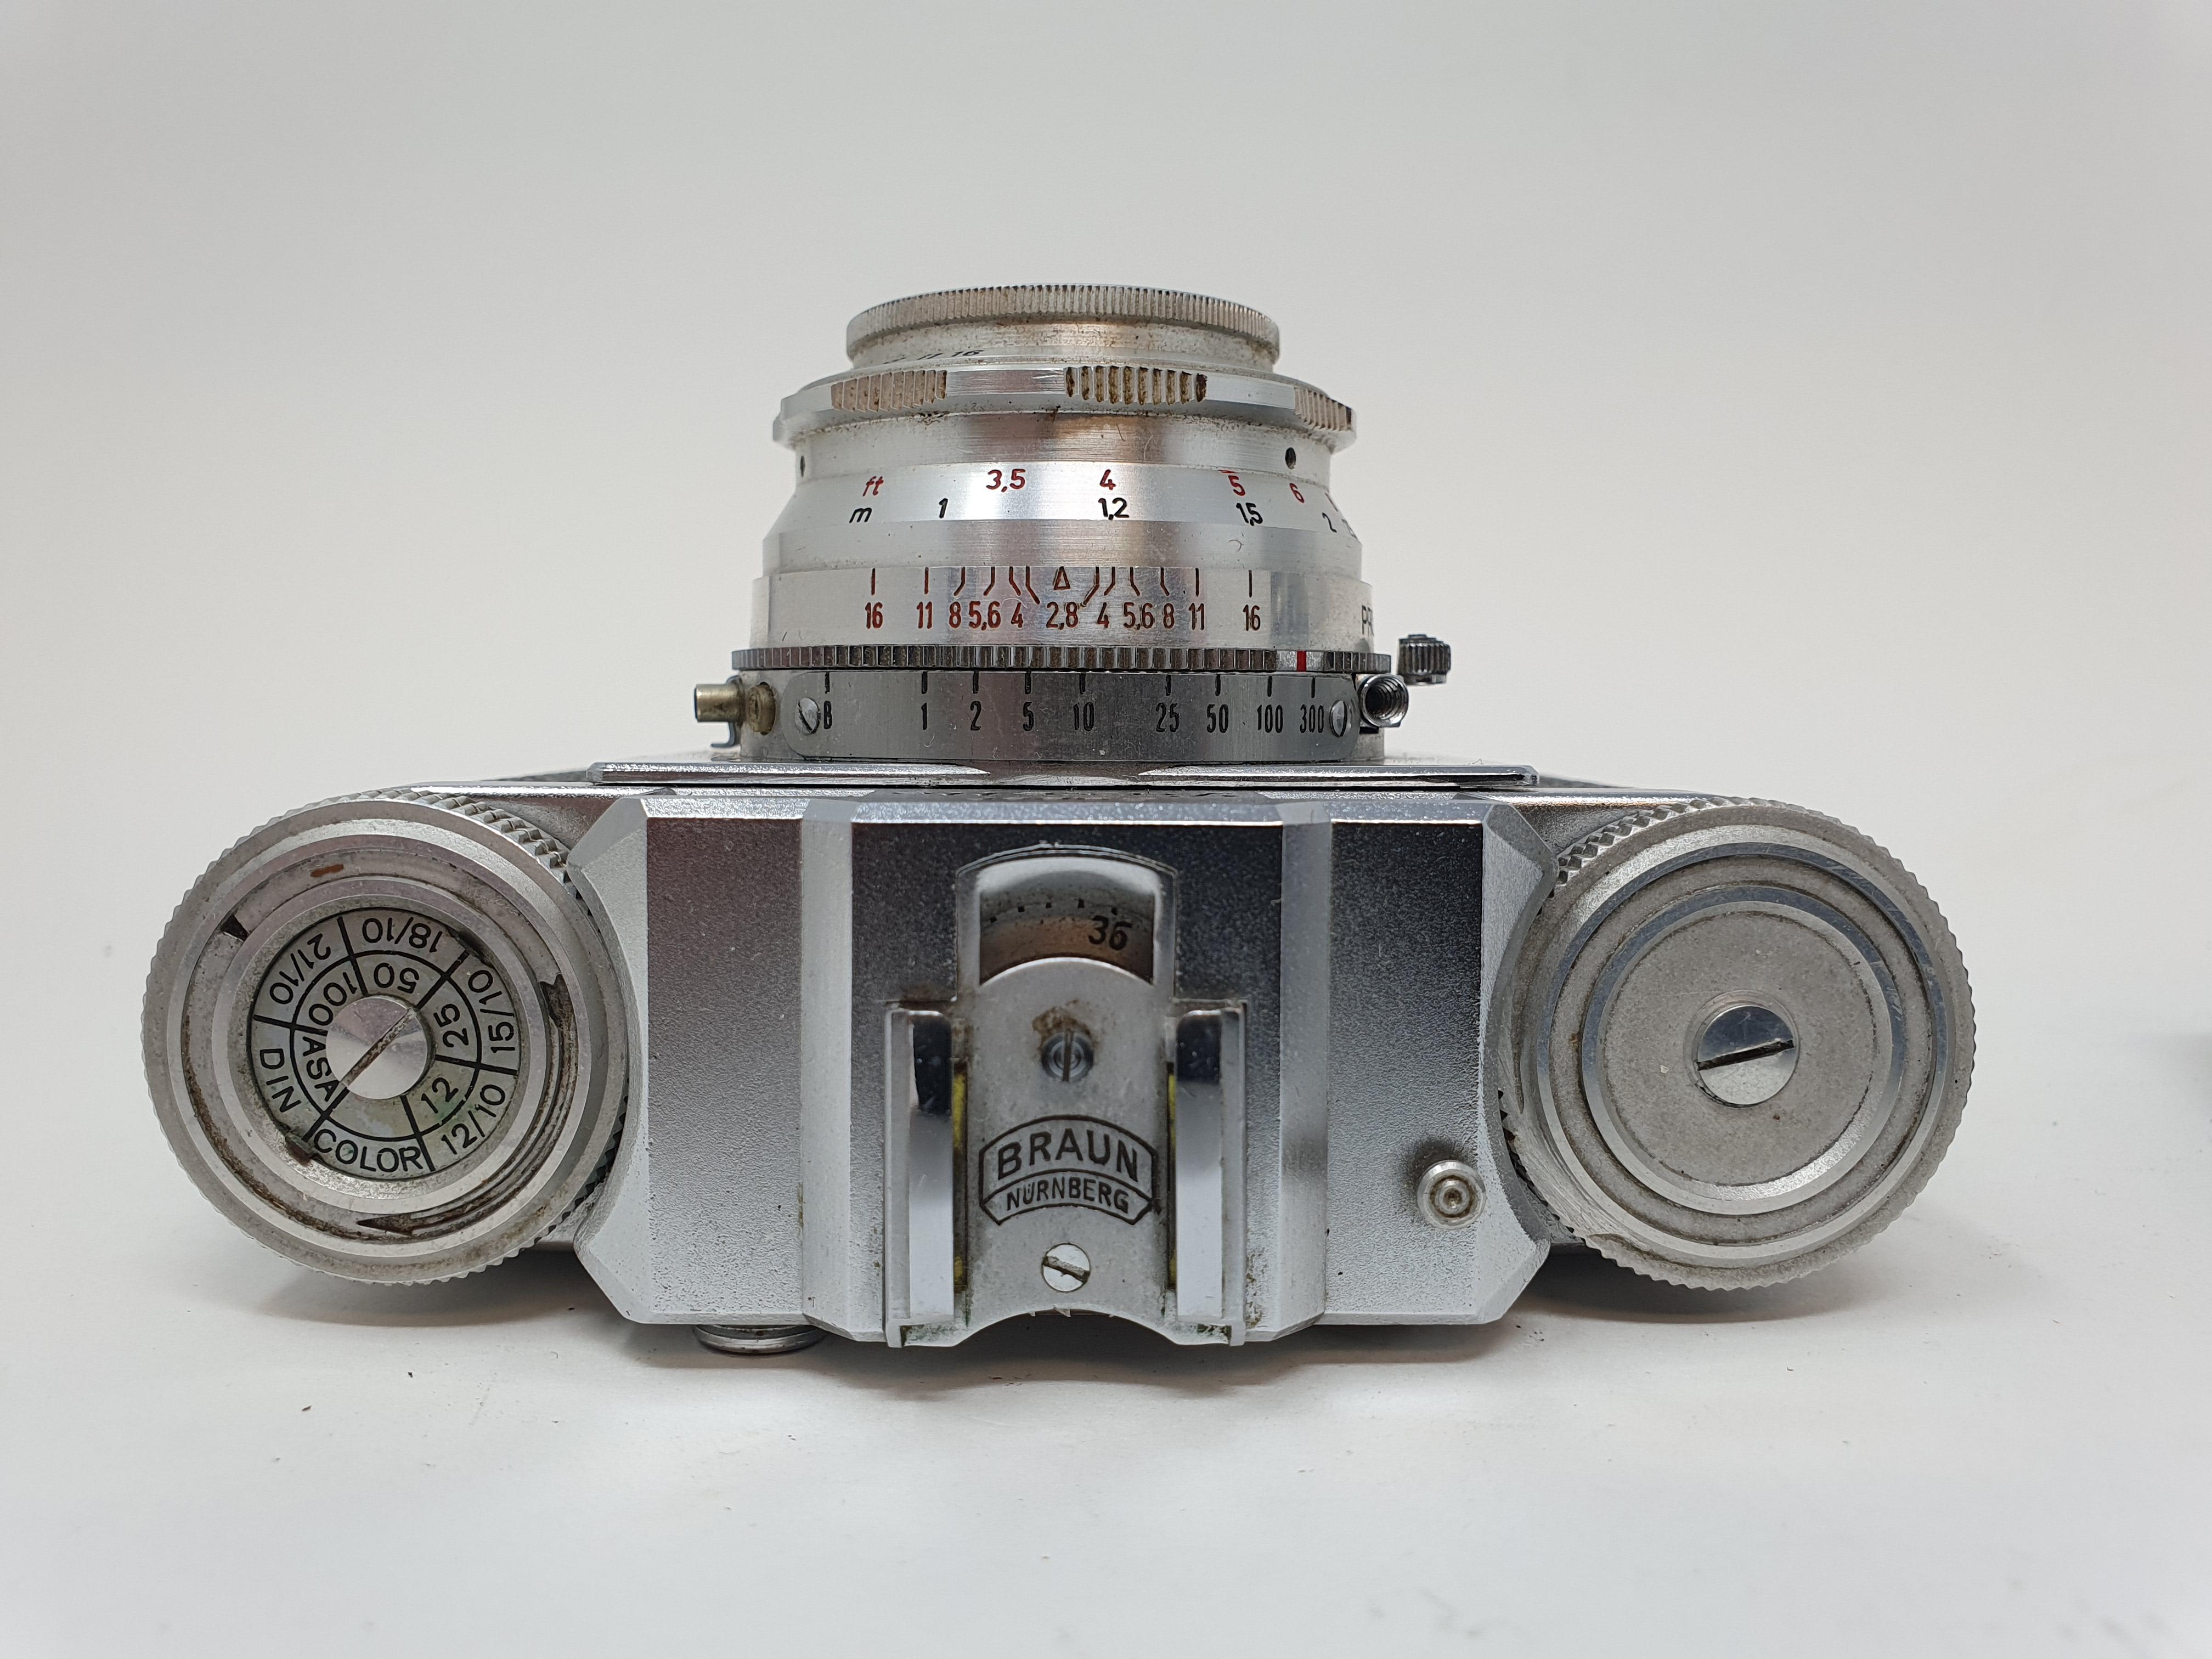 A Kodak Retinette IIA camera and a Braun Super Paxette camera (2) Provenance: Part of a vast - Image 3 of 4